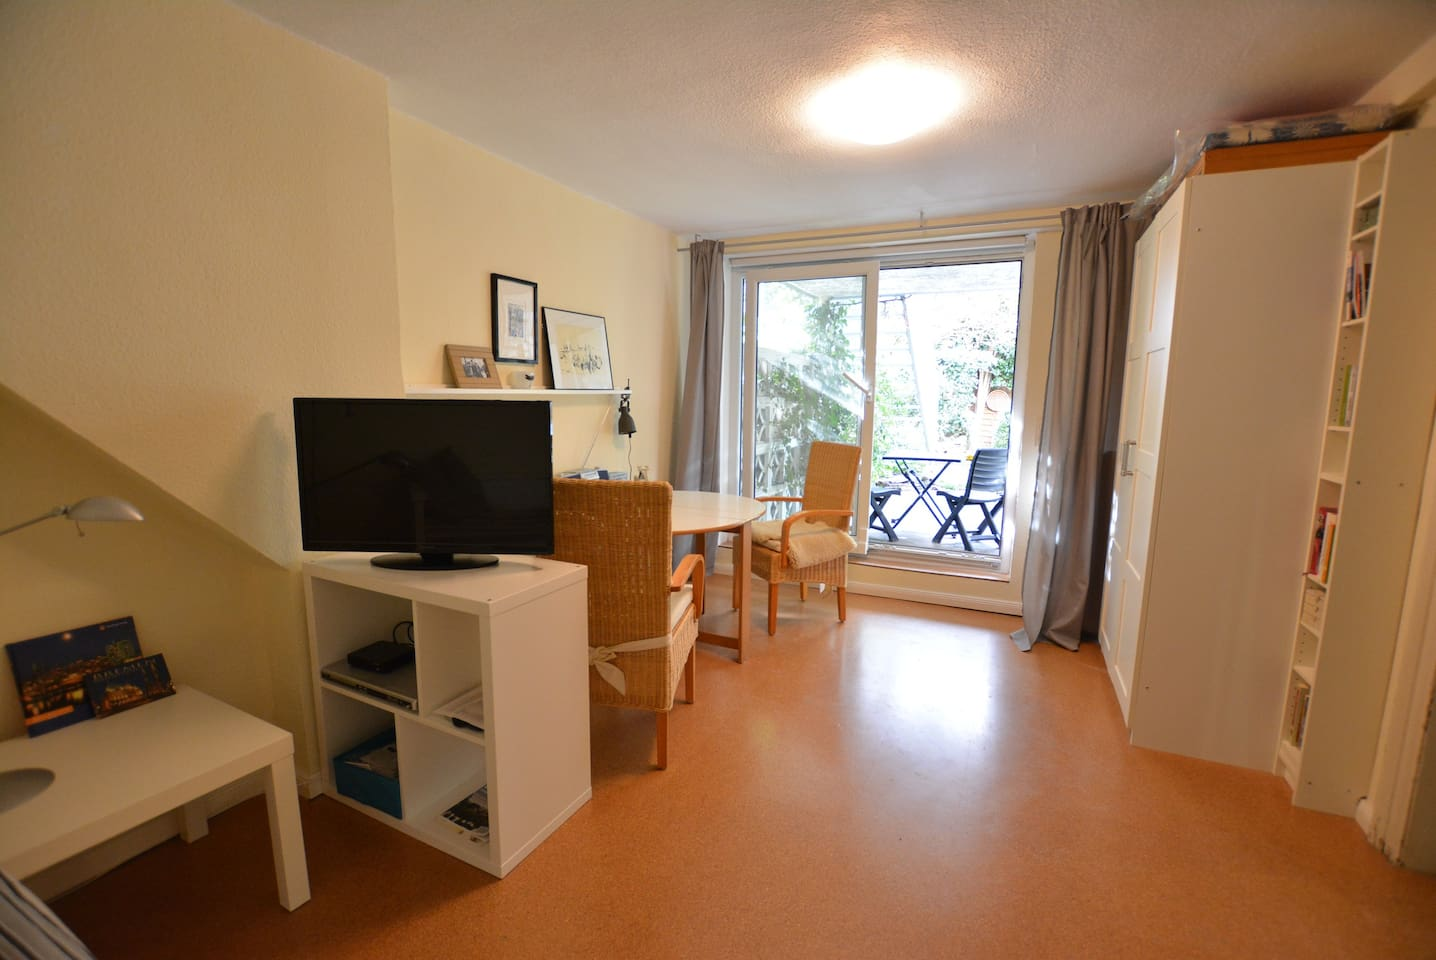 Living and sleeping room with garden access -  Wohn-/Schlafzimmer mit Gartenzugang